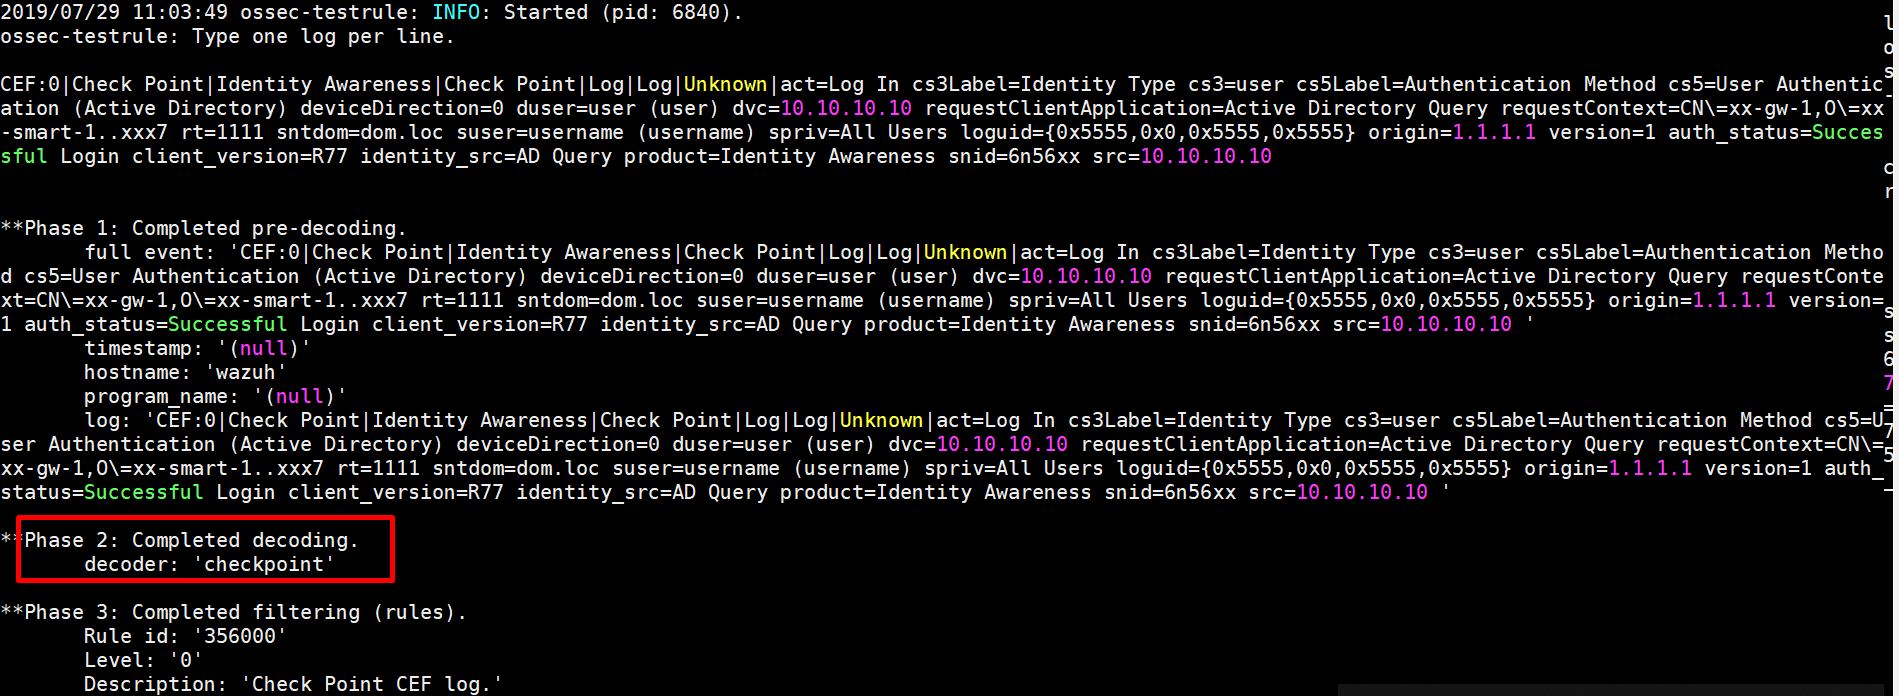 Wazuh Decoder Checkpoint CEF Log error · Issue #3765 · wazuh